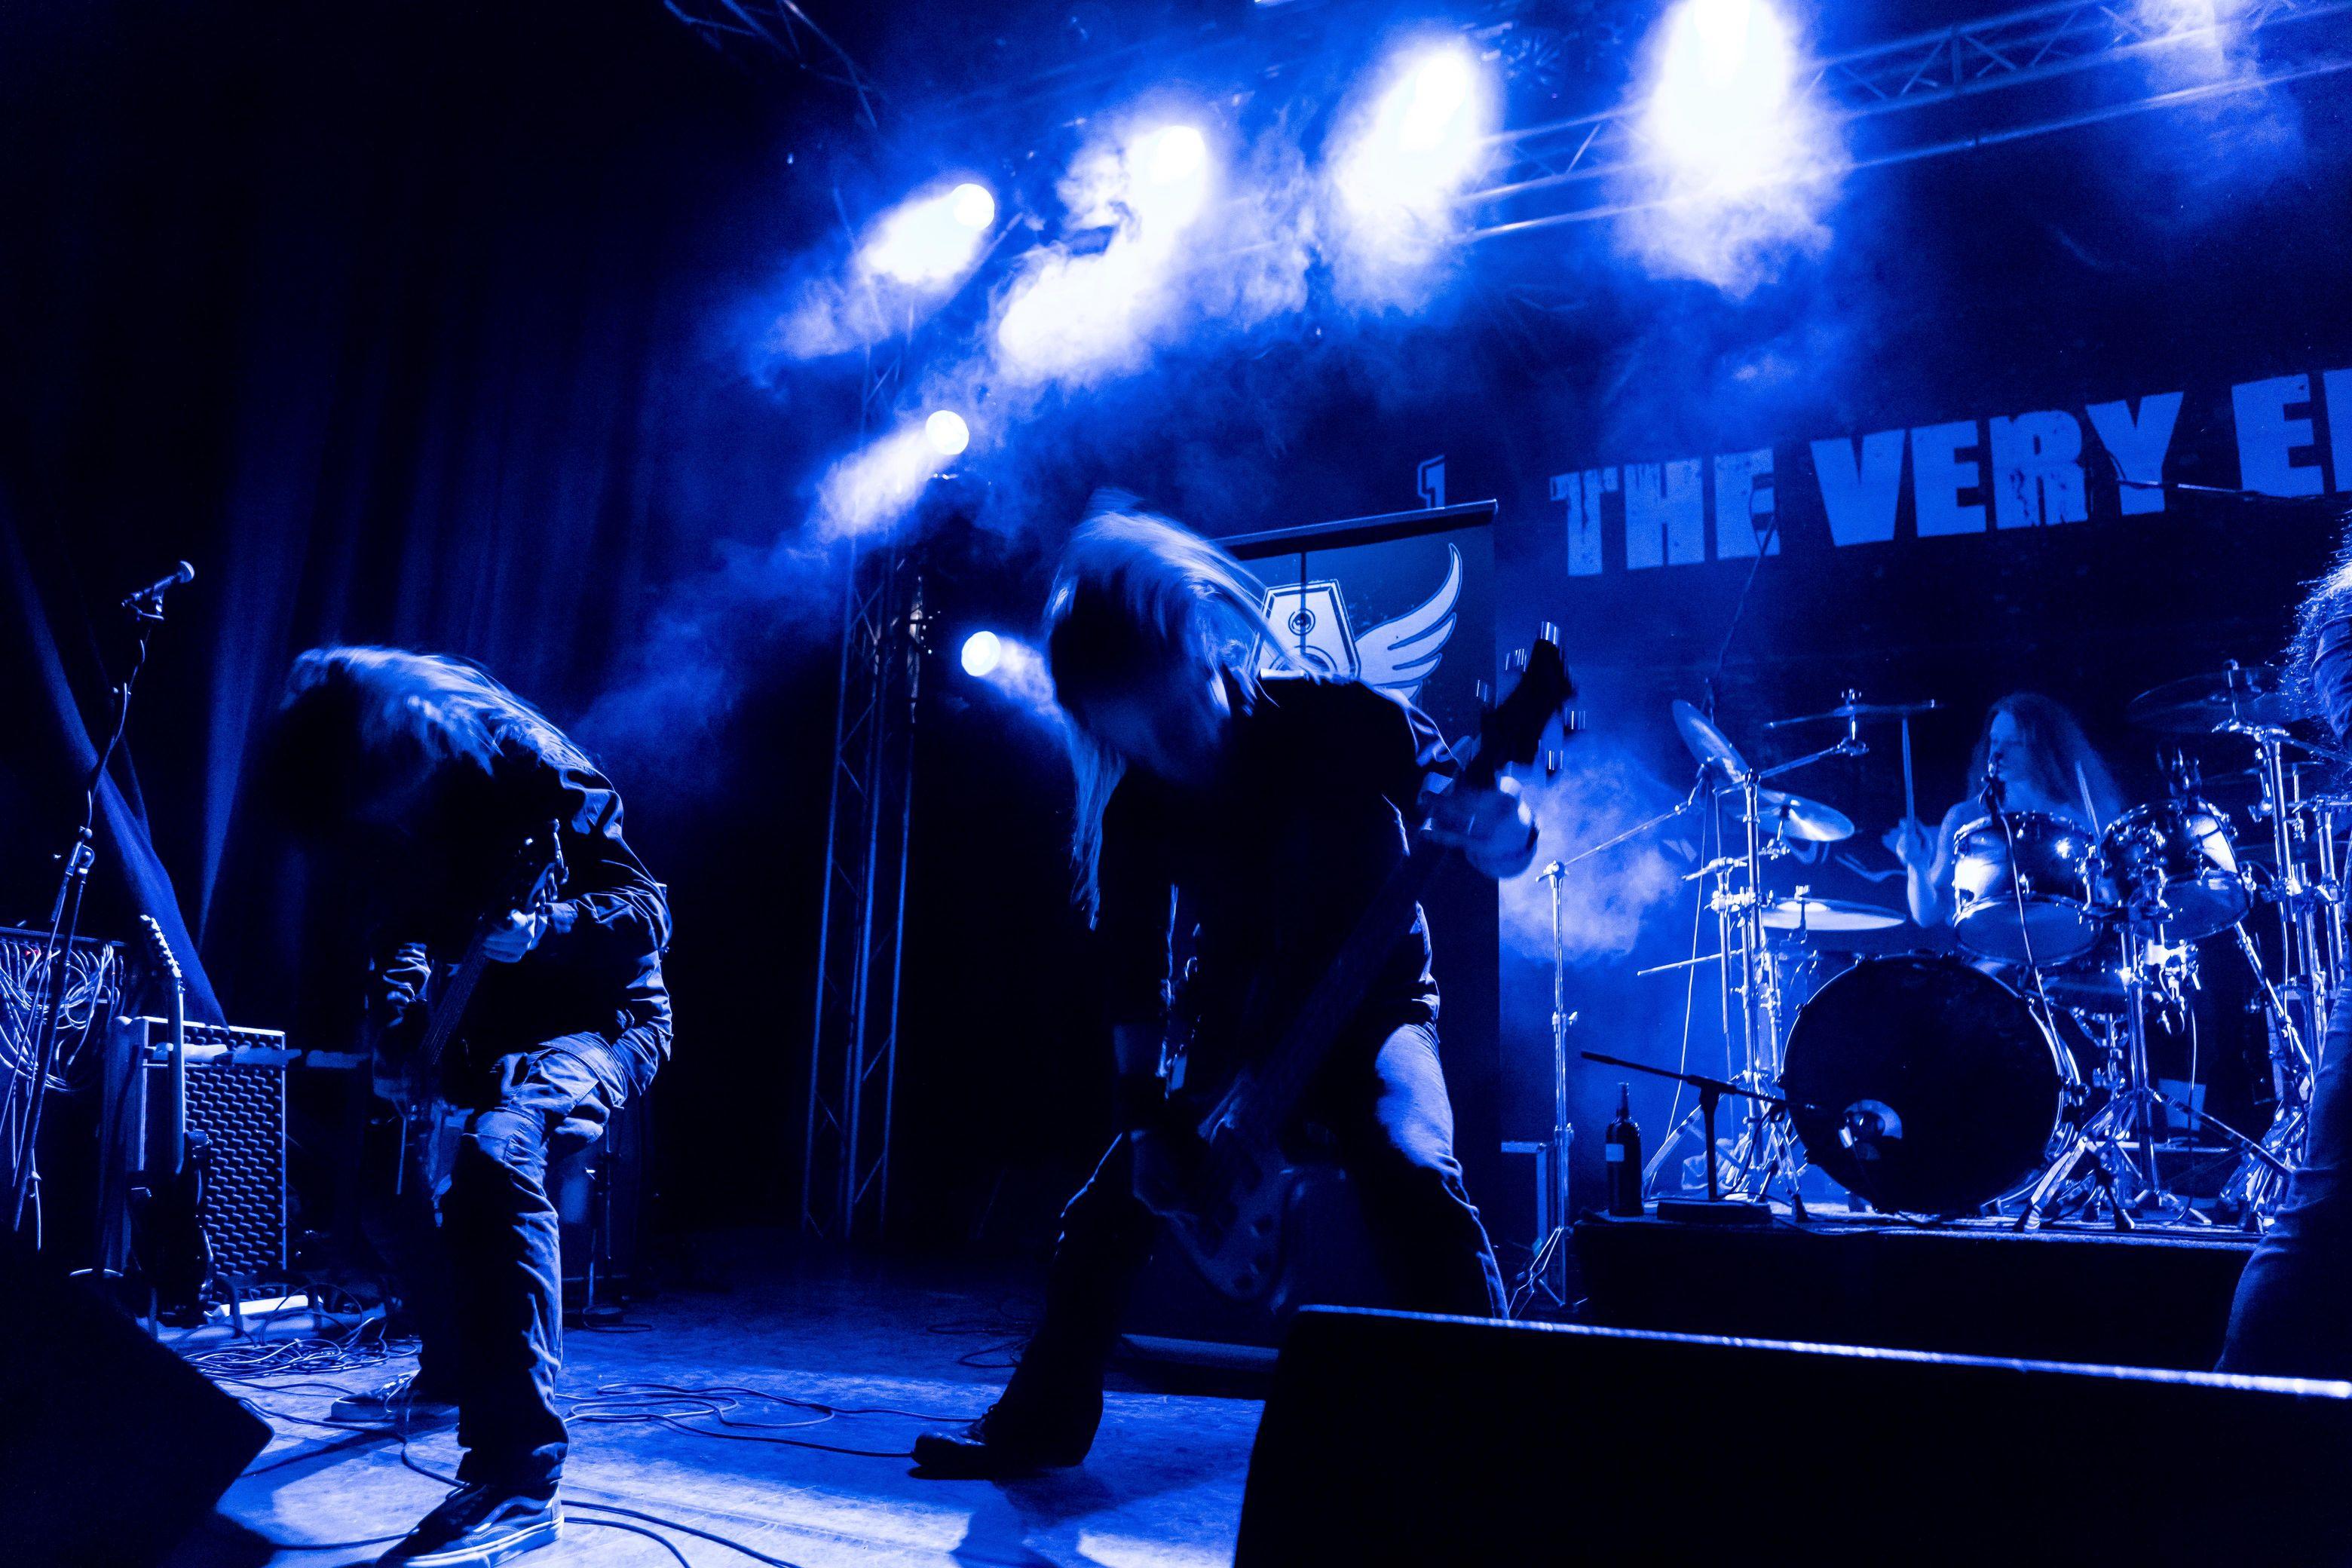 the-very-end-live-zeche-carl-essen-germany-thrash-metal_13